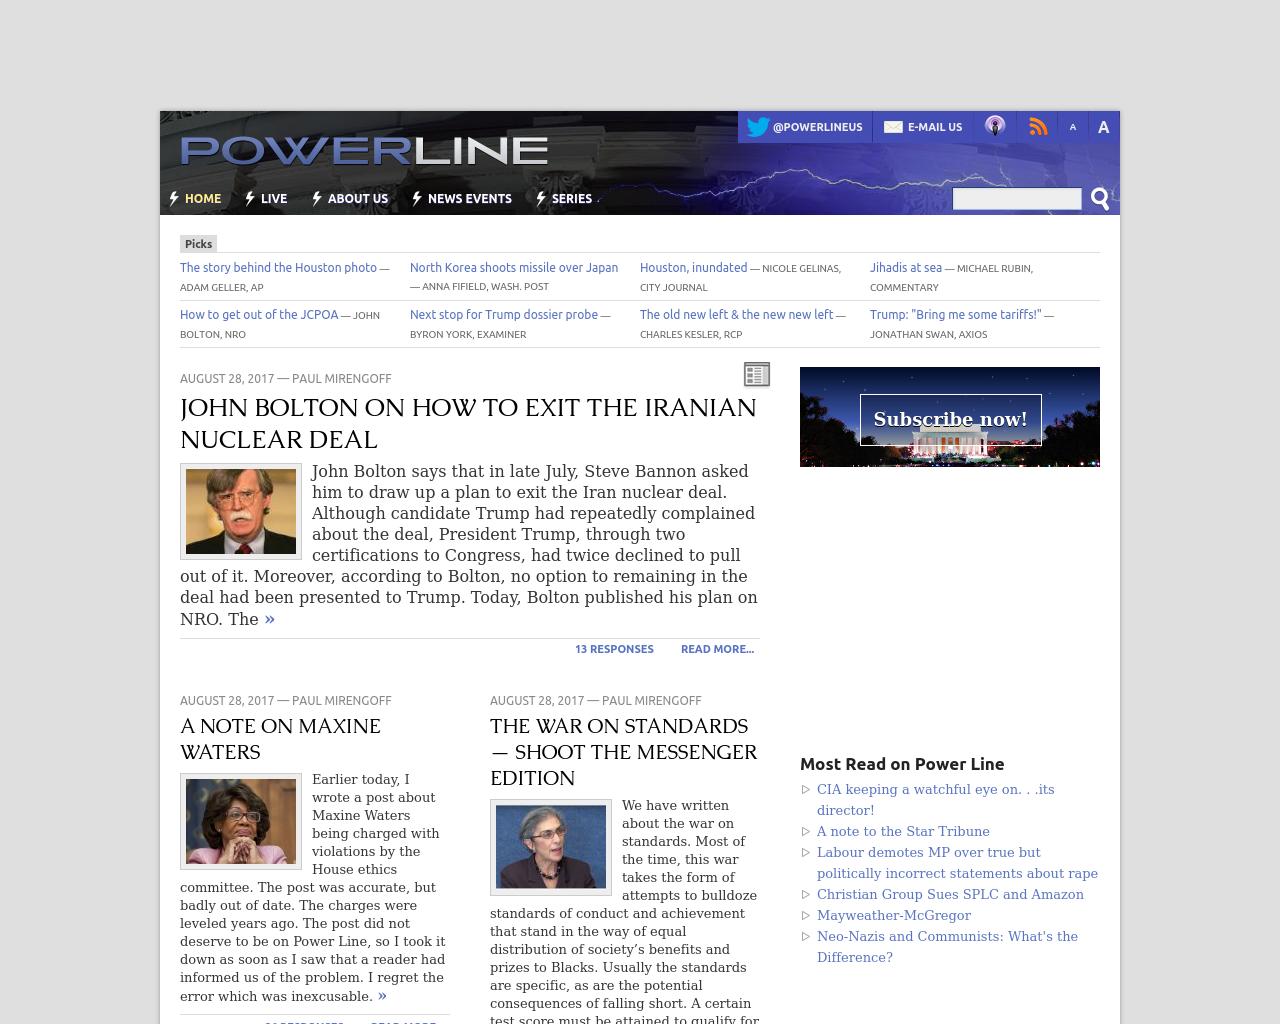 Power-Line-Blog-Advertising-Reviews-Pricing